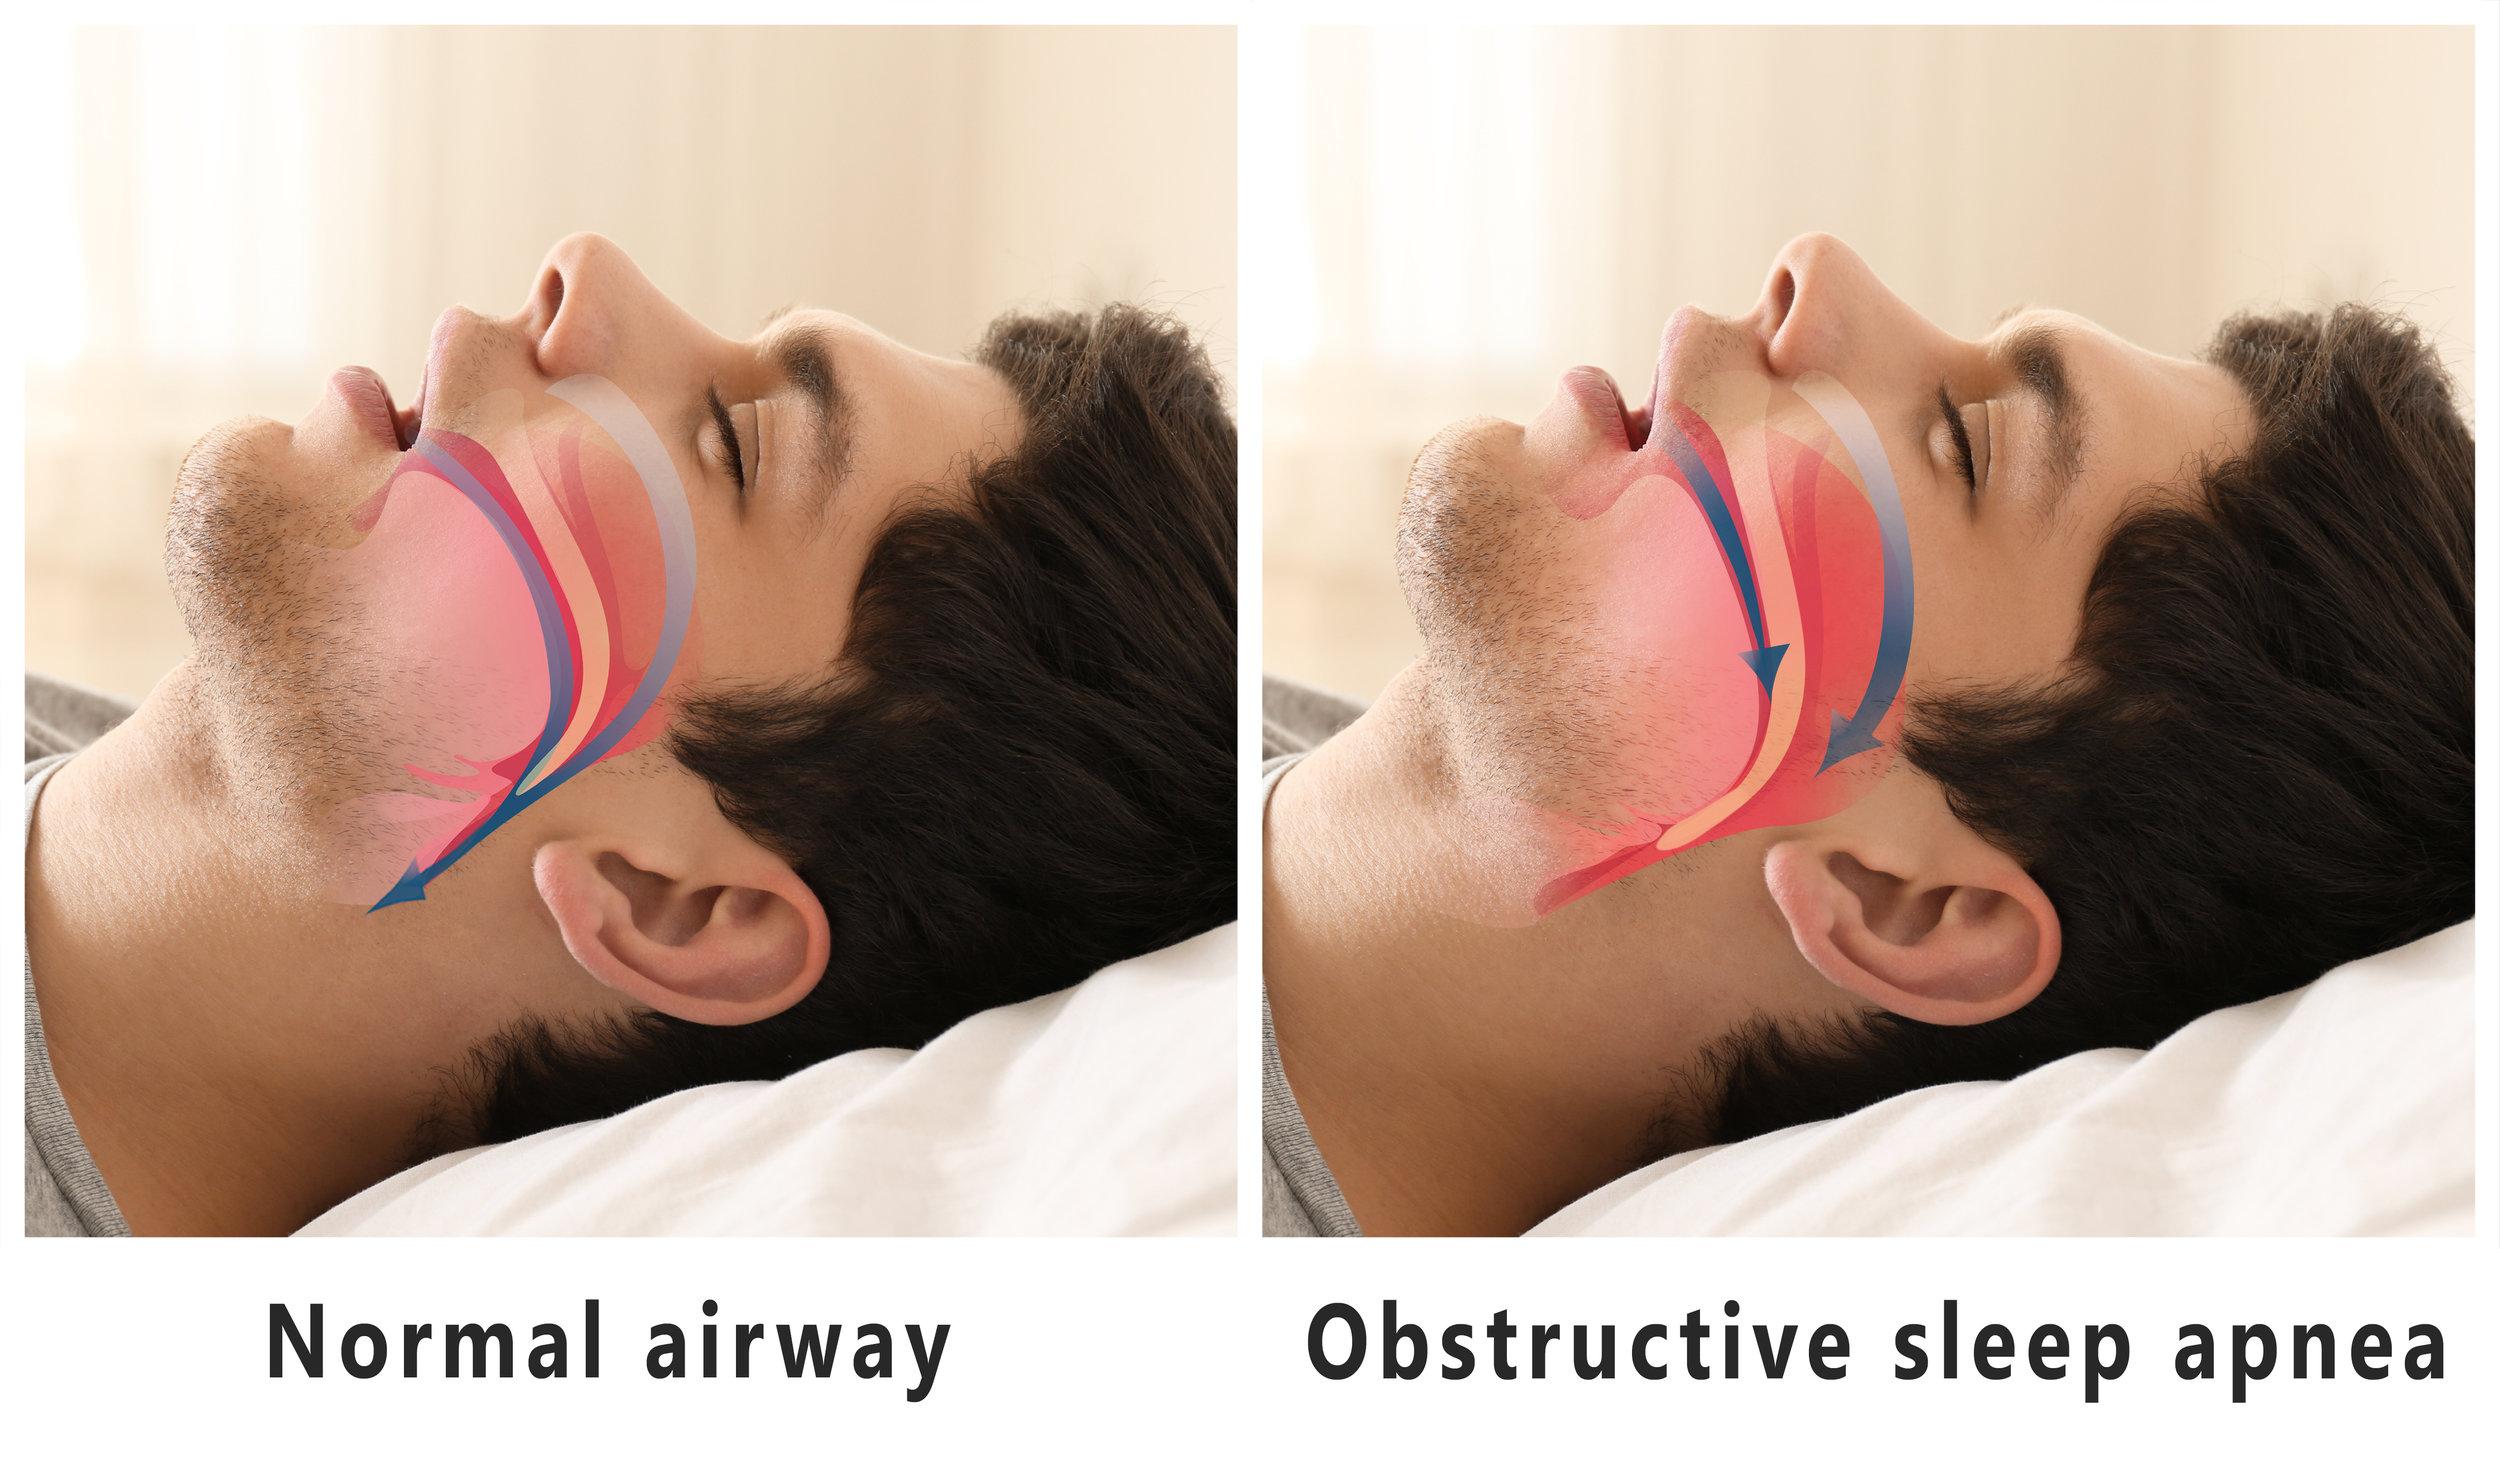 Normal Airway vs Obstructive Sleep Apnea